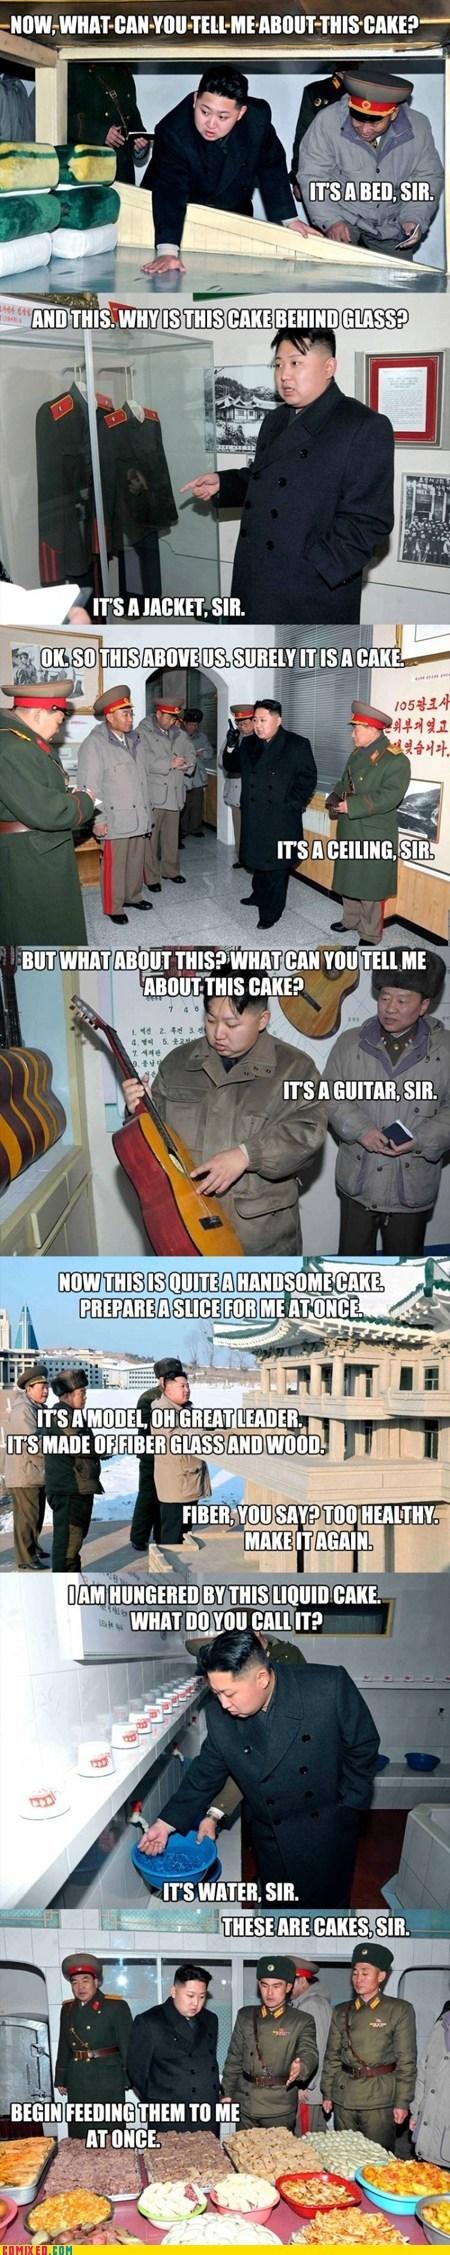 best of week cake North Korea the internets - 5779106304